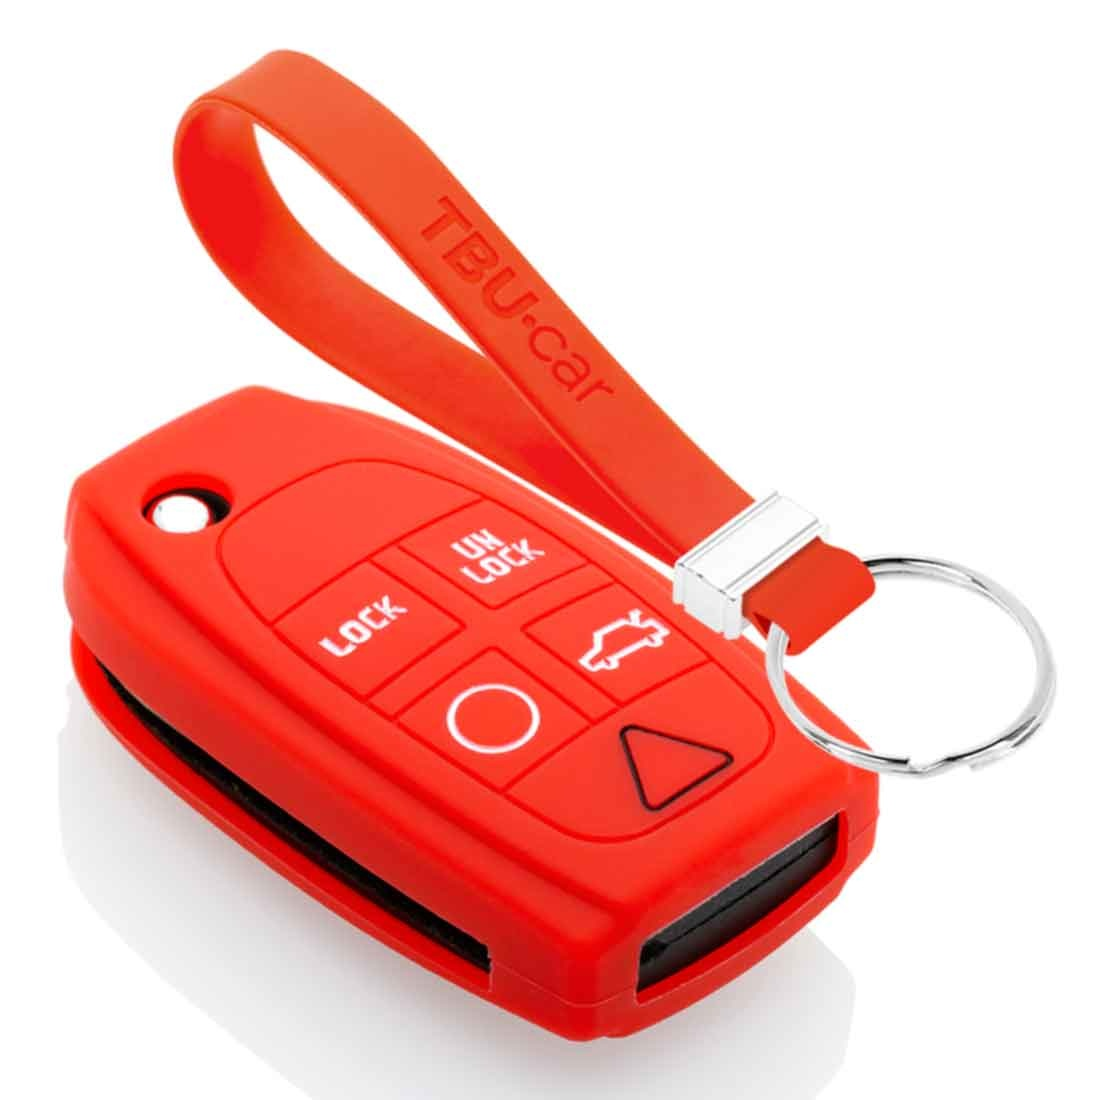 TBU car TBU car Sleutel cover compatibel met Volvo - Silicone sleutelhoesje - beschermhoesje autosleutel - Rood